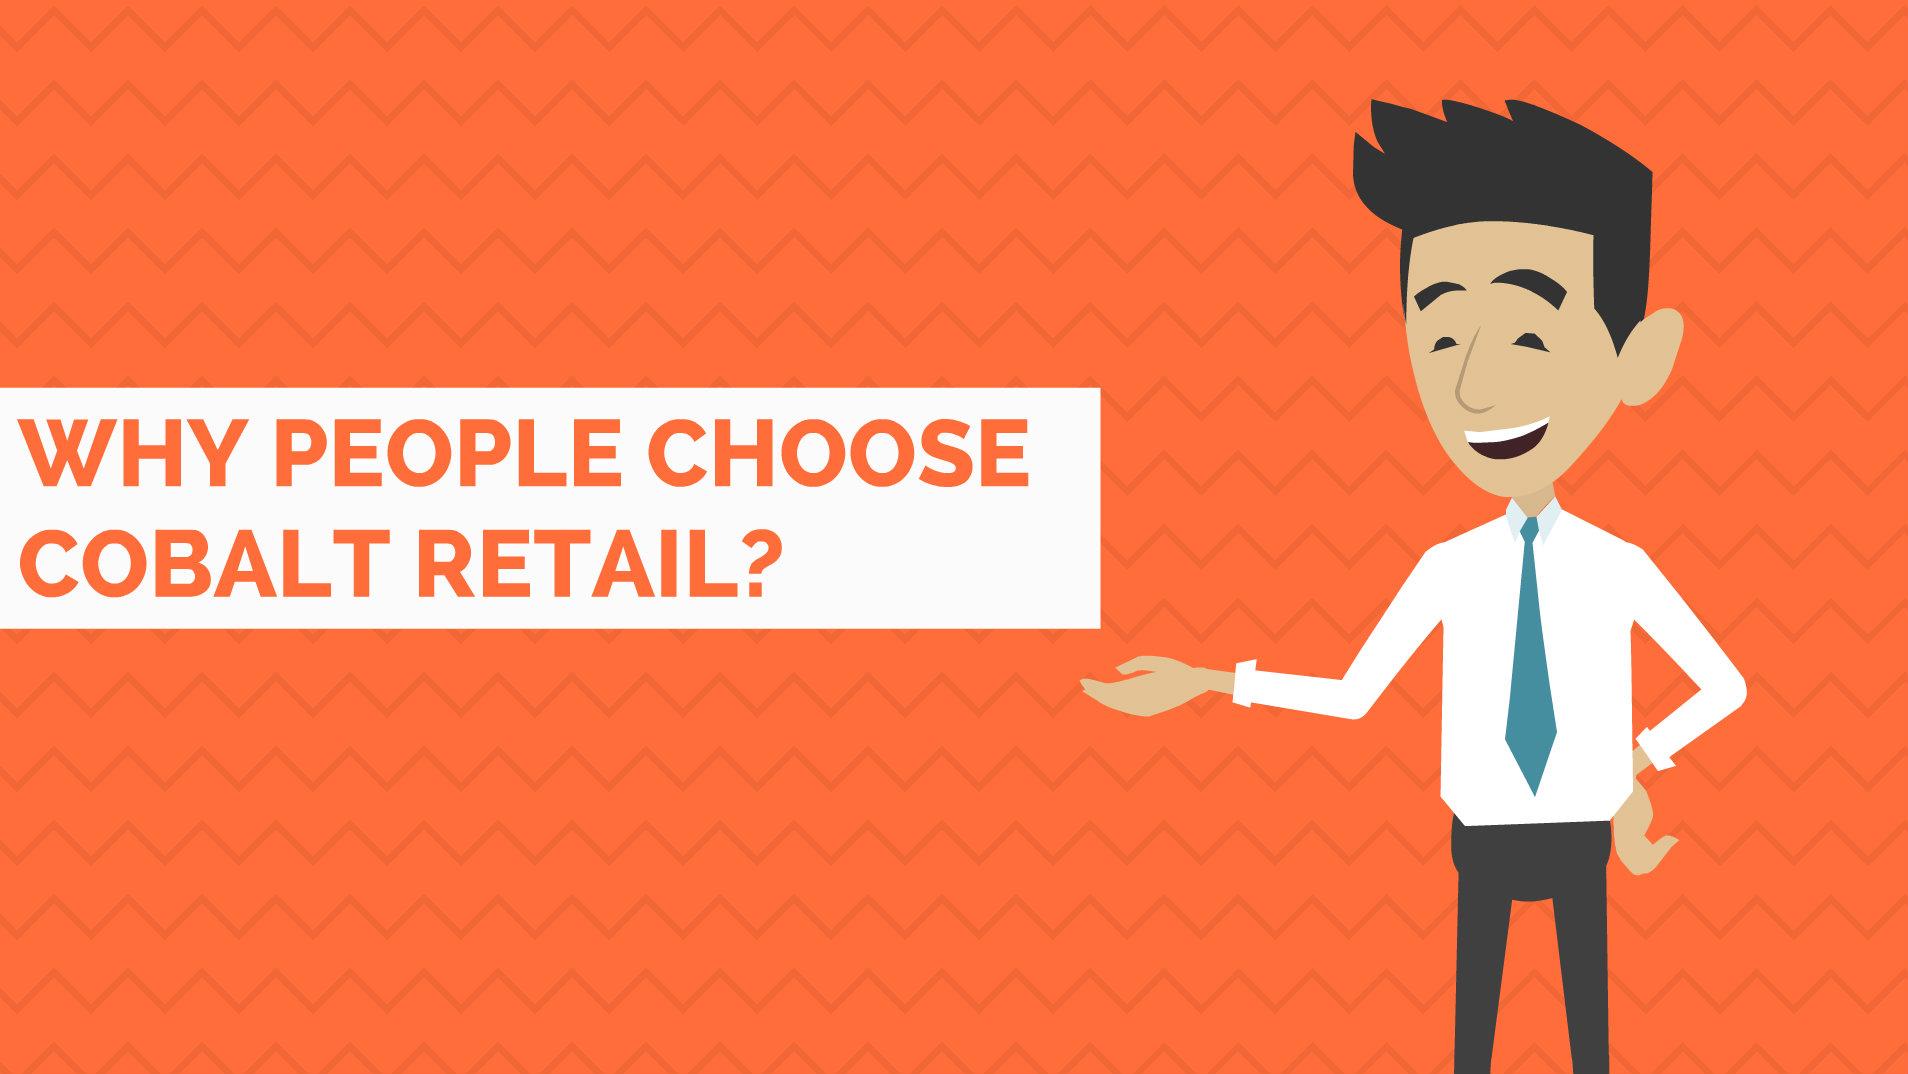 Why Choose Cobalt Retail?